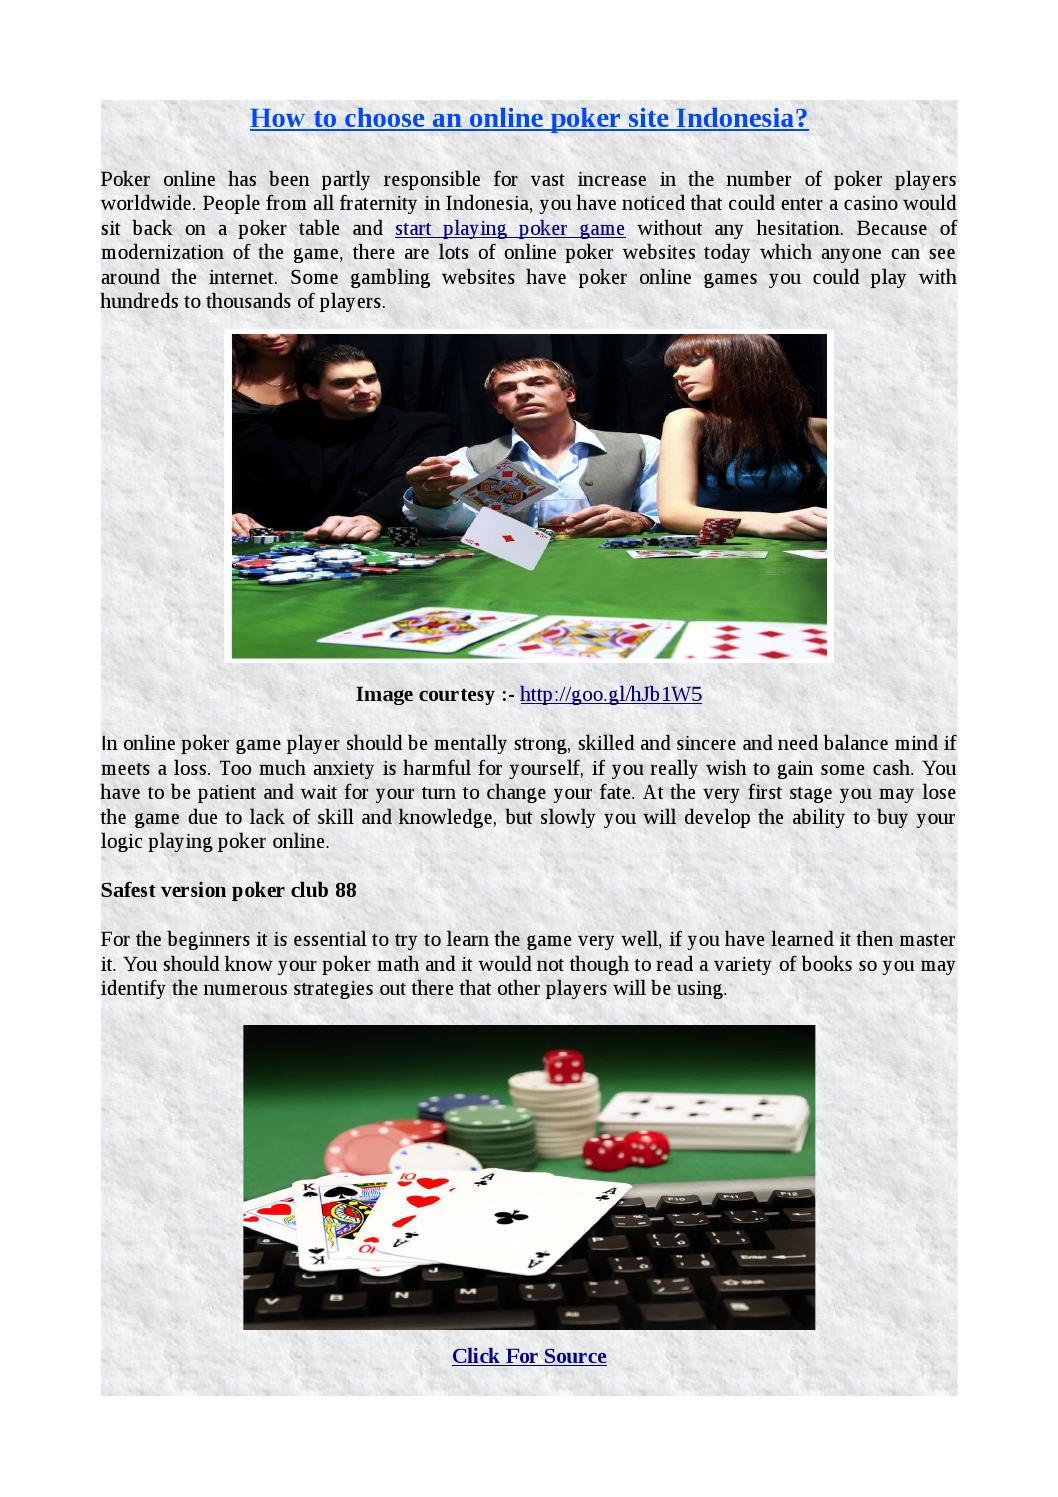 How To Choose An Online Poker Site Indonesia By Edwinbutlar Issuu